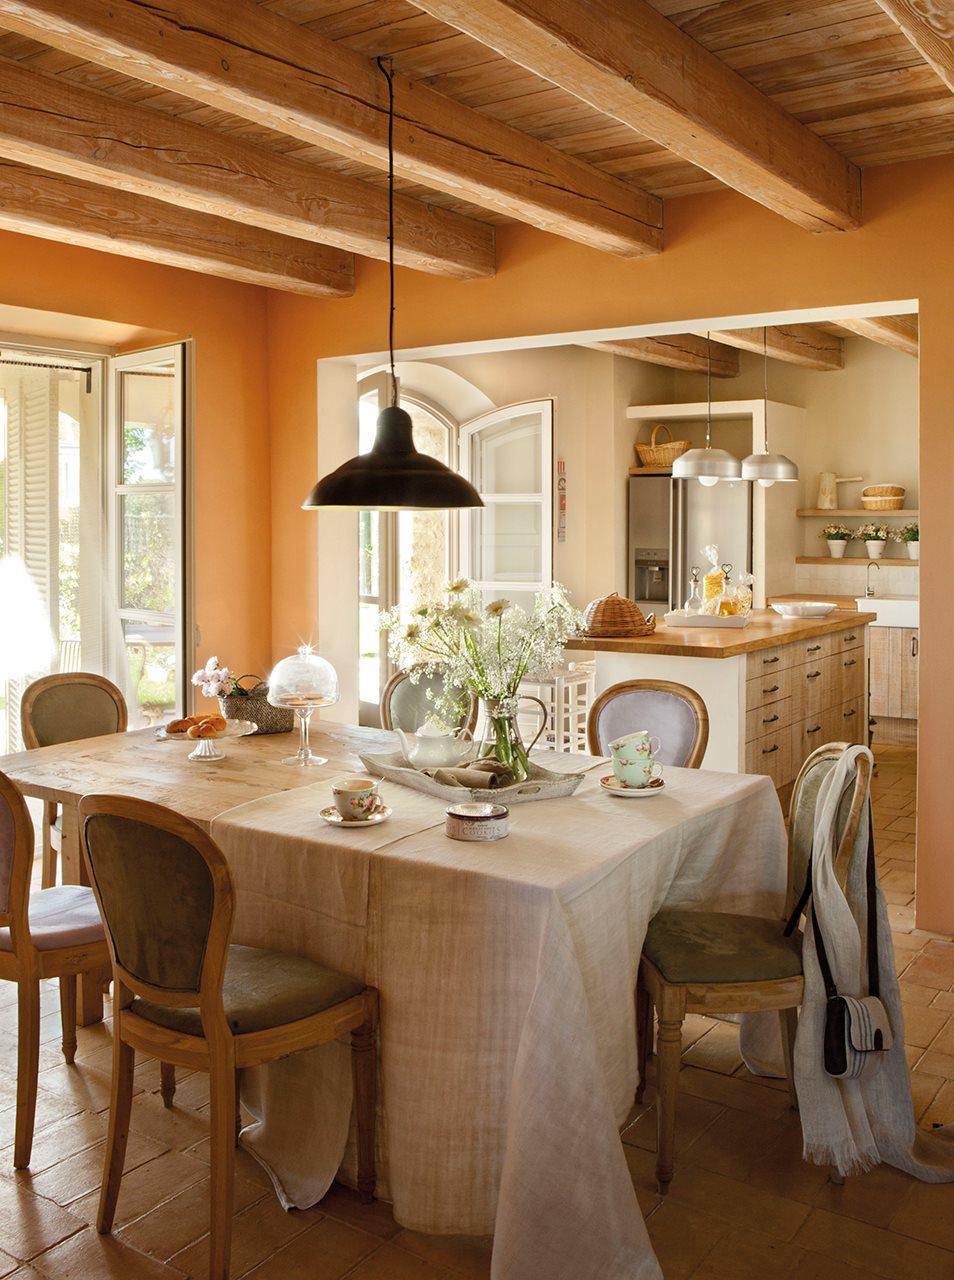 20 ideas para renovar tu casa a todo color - Cocina comedor rustico ...